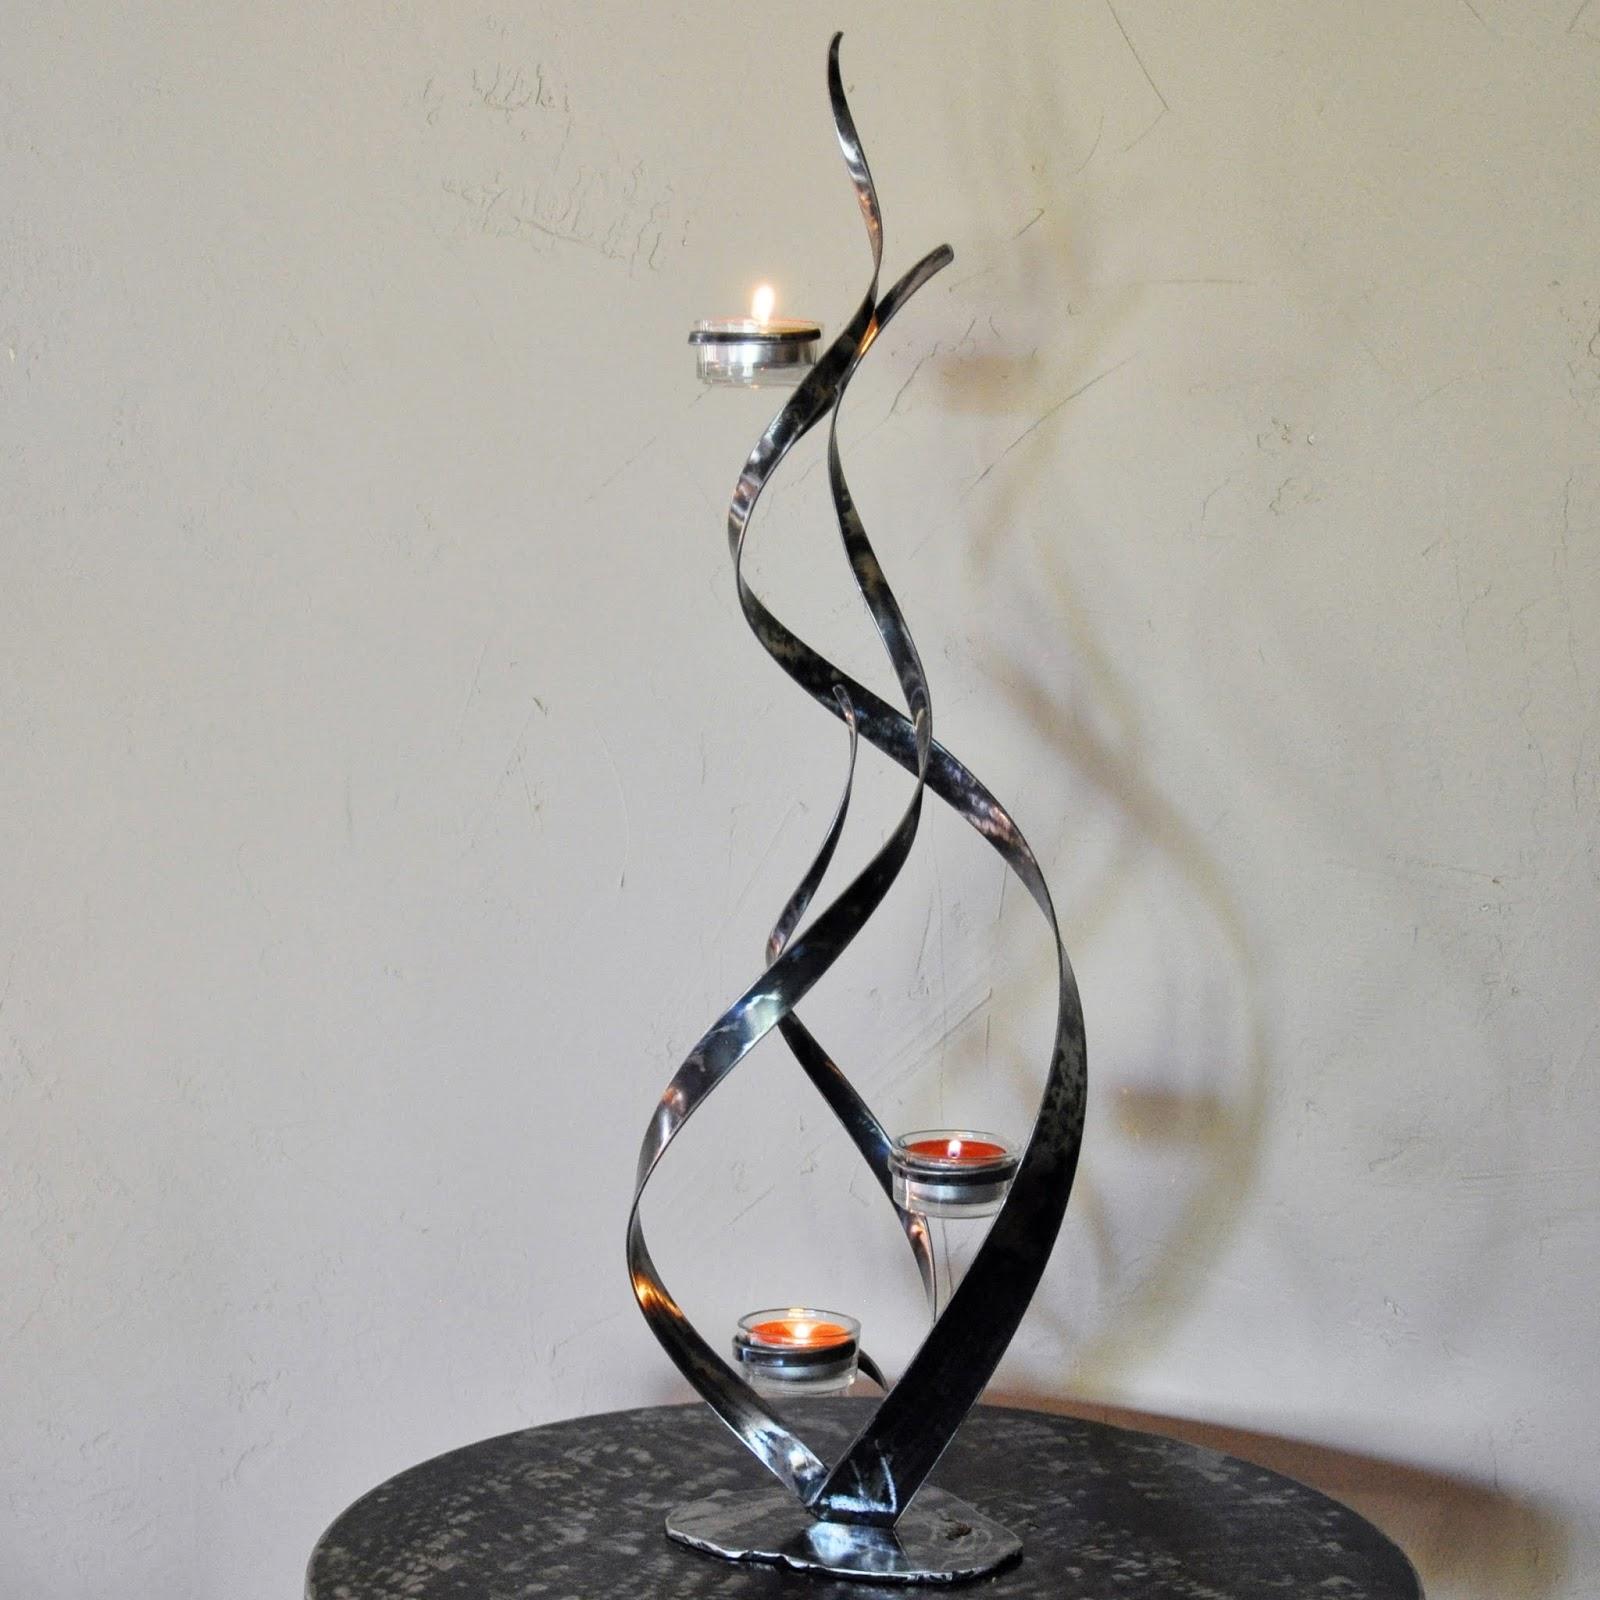 cr ateur d 39 objets d co en fer forg bougeoirs luminaires porte bouteille bougeoir flamme. Black Bedroom Furniture Sets. Home Design Ideas